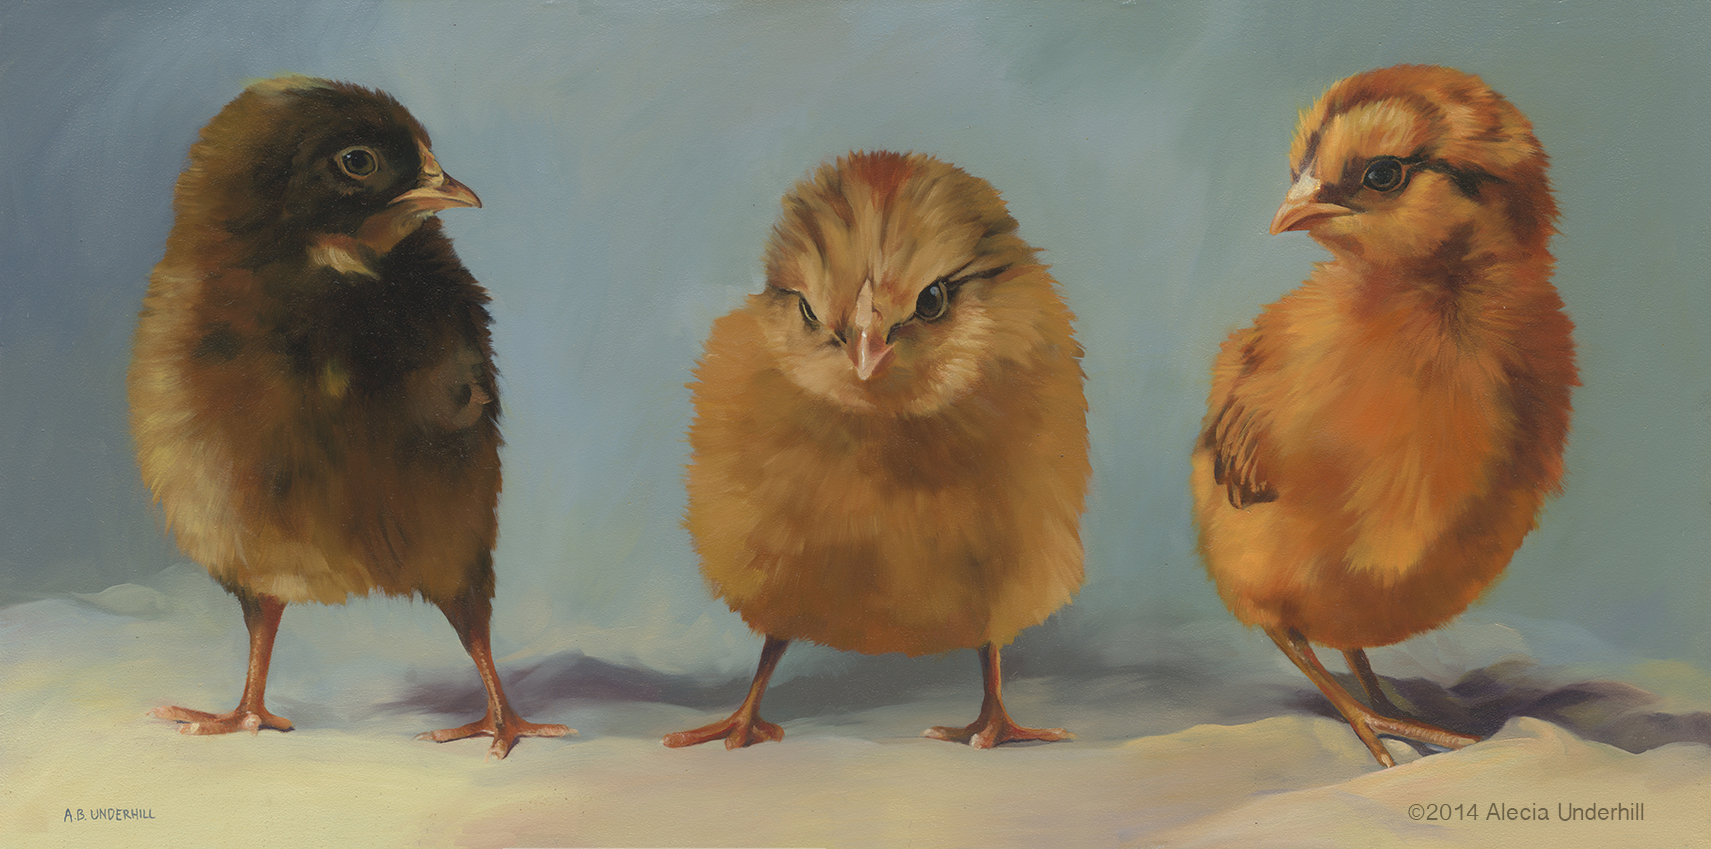 Three Little Chicks